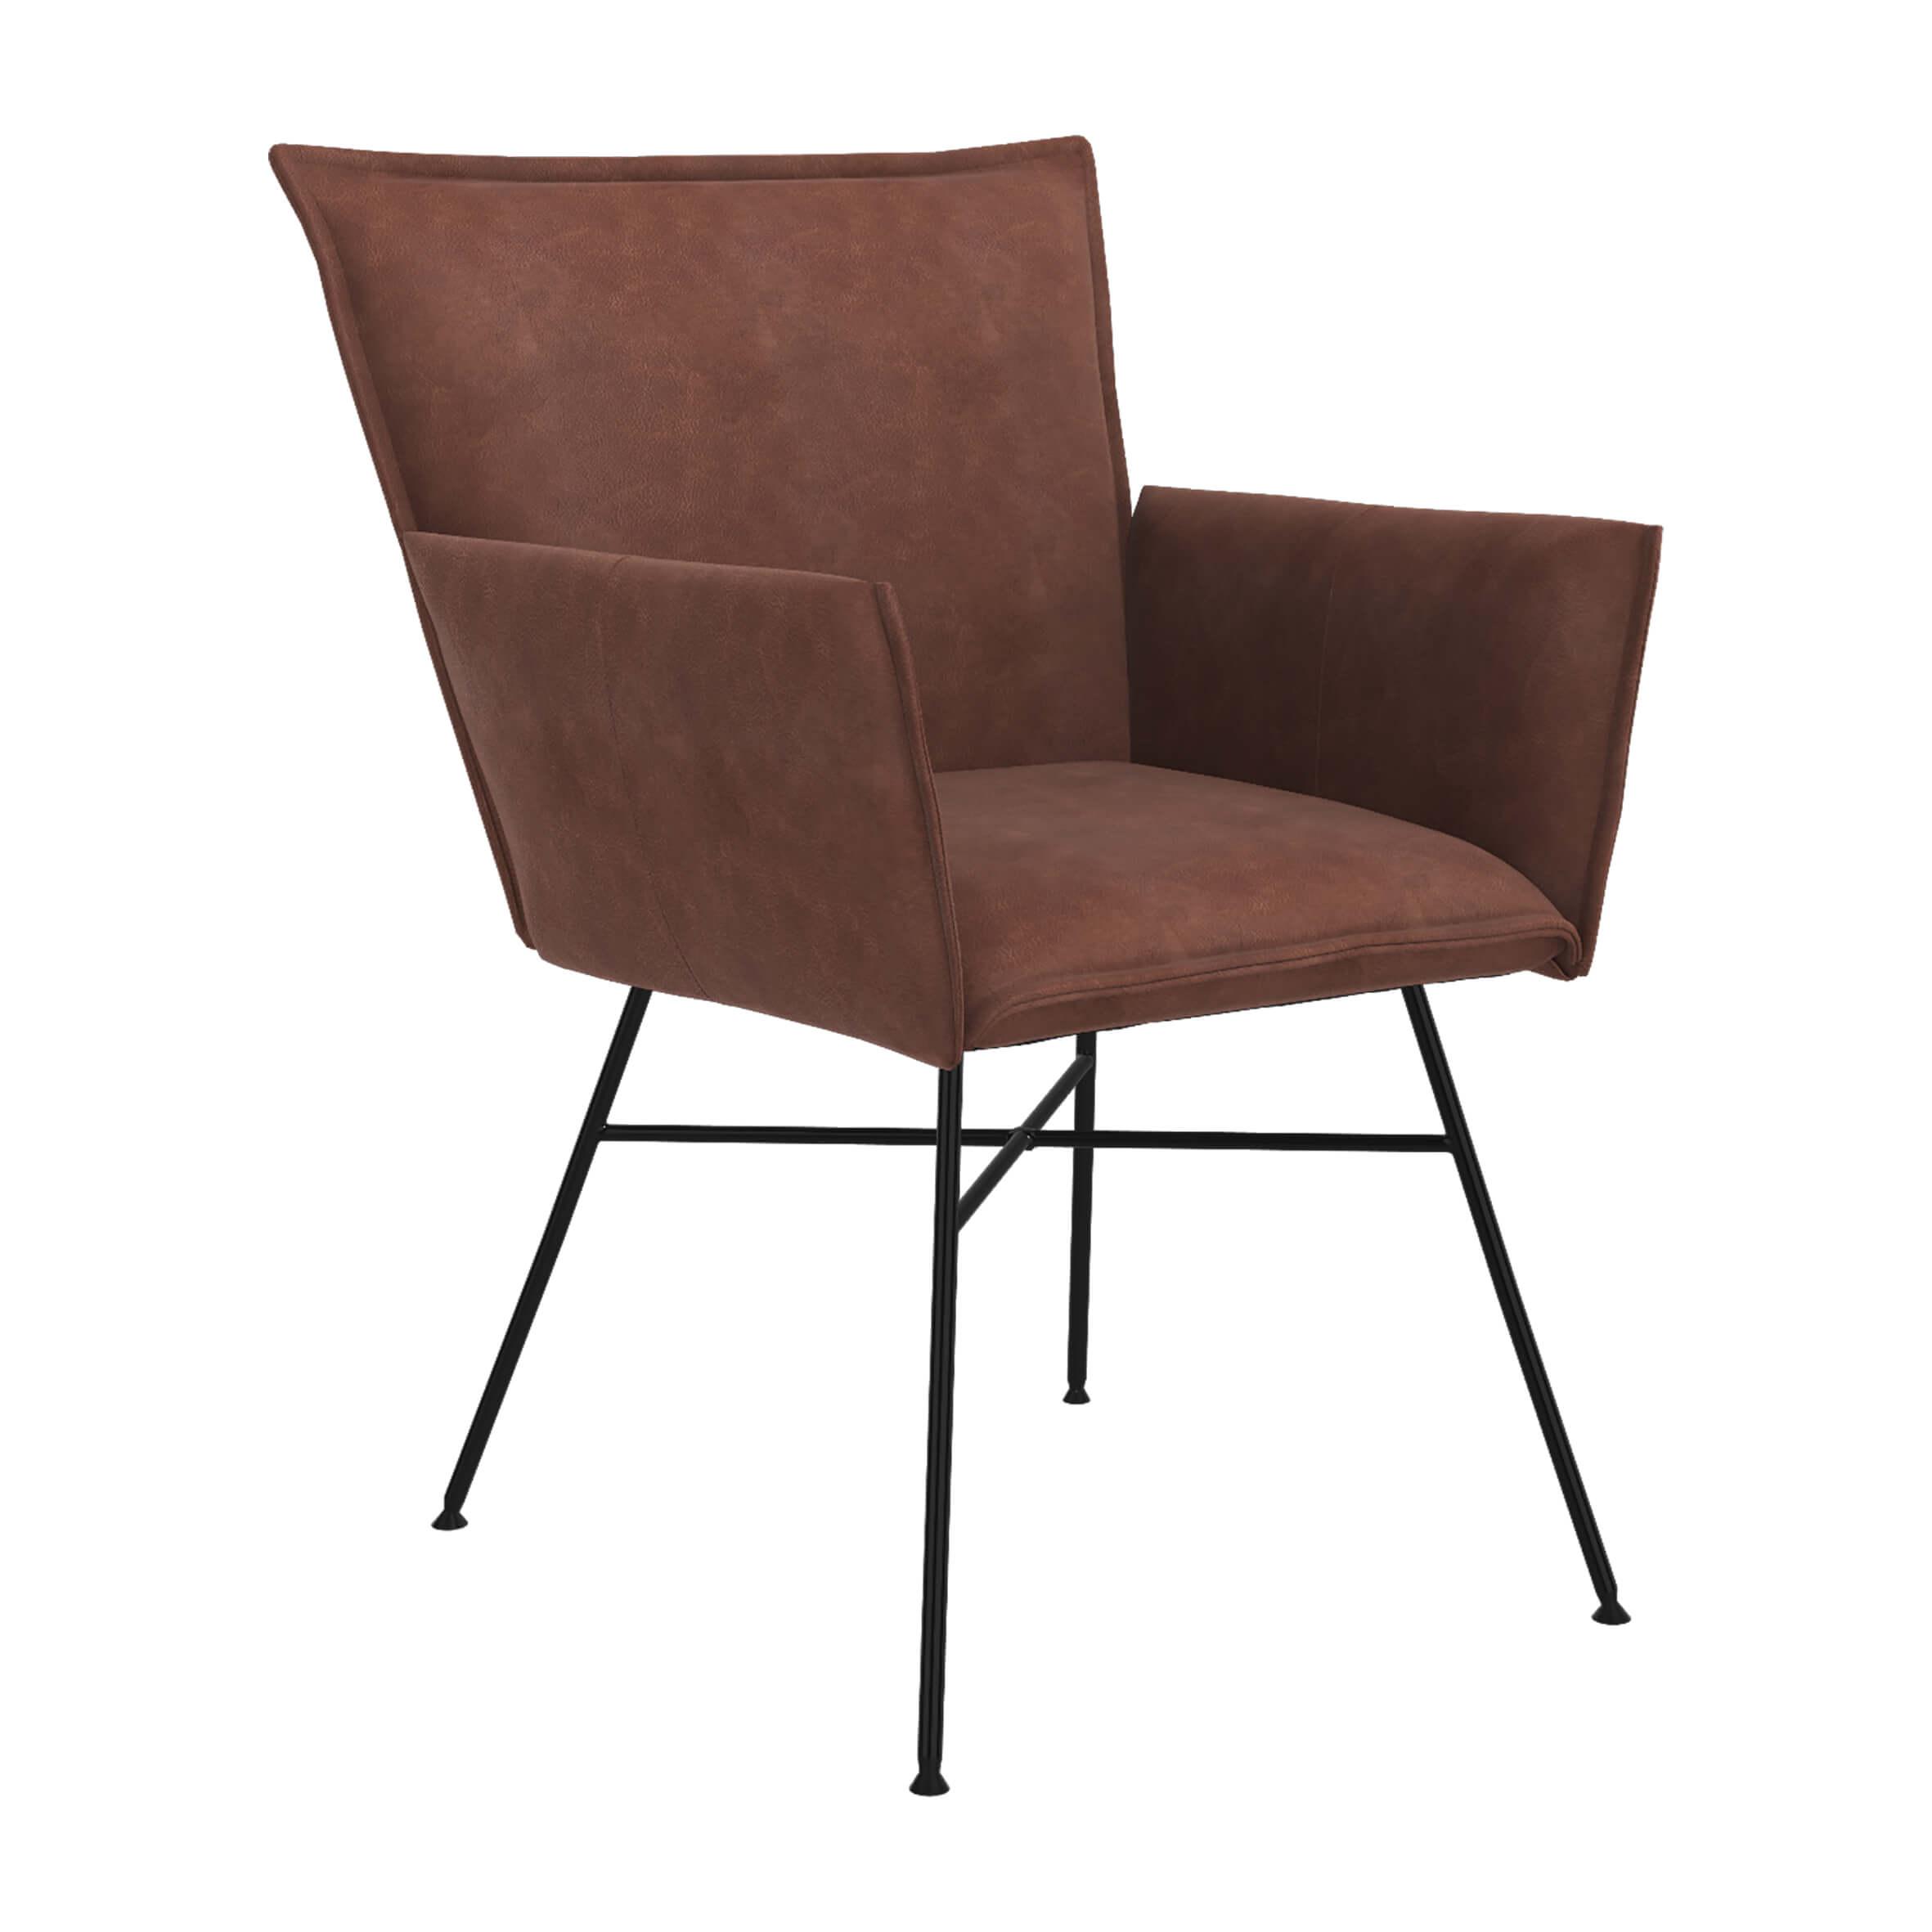 Jess Design - Sanne stol